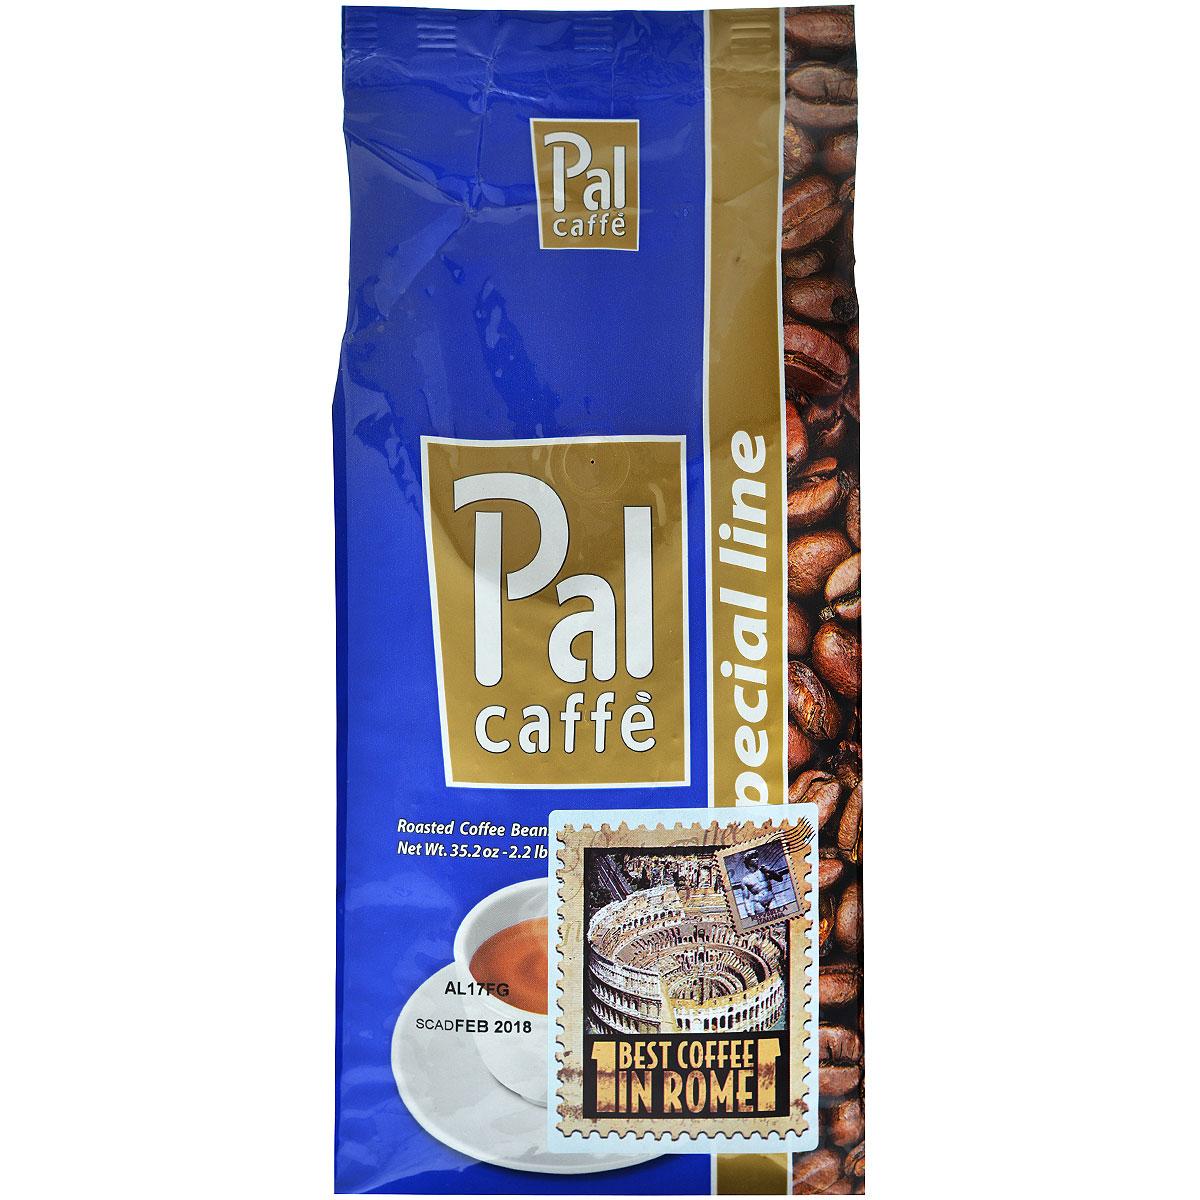 Palombini Pal Oro кофе в зернах, 1 кг8009785354058